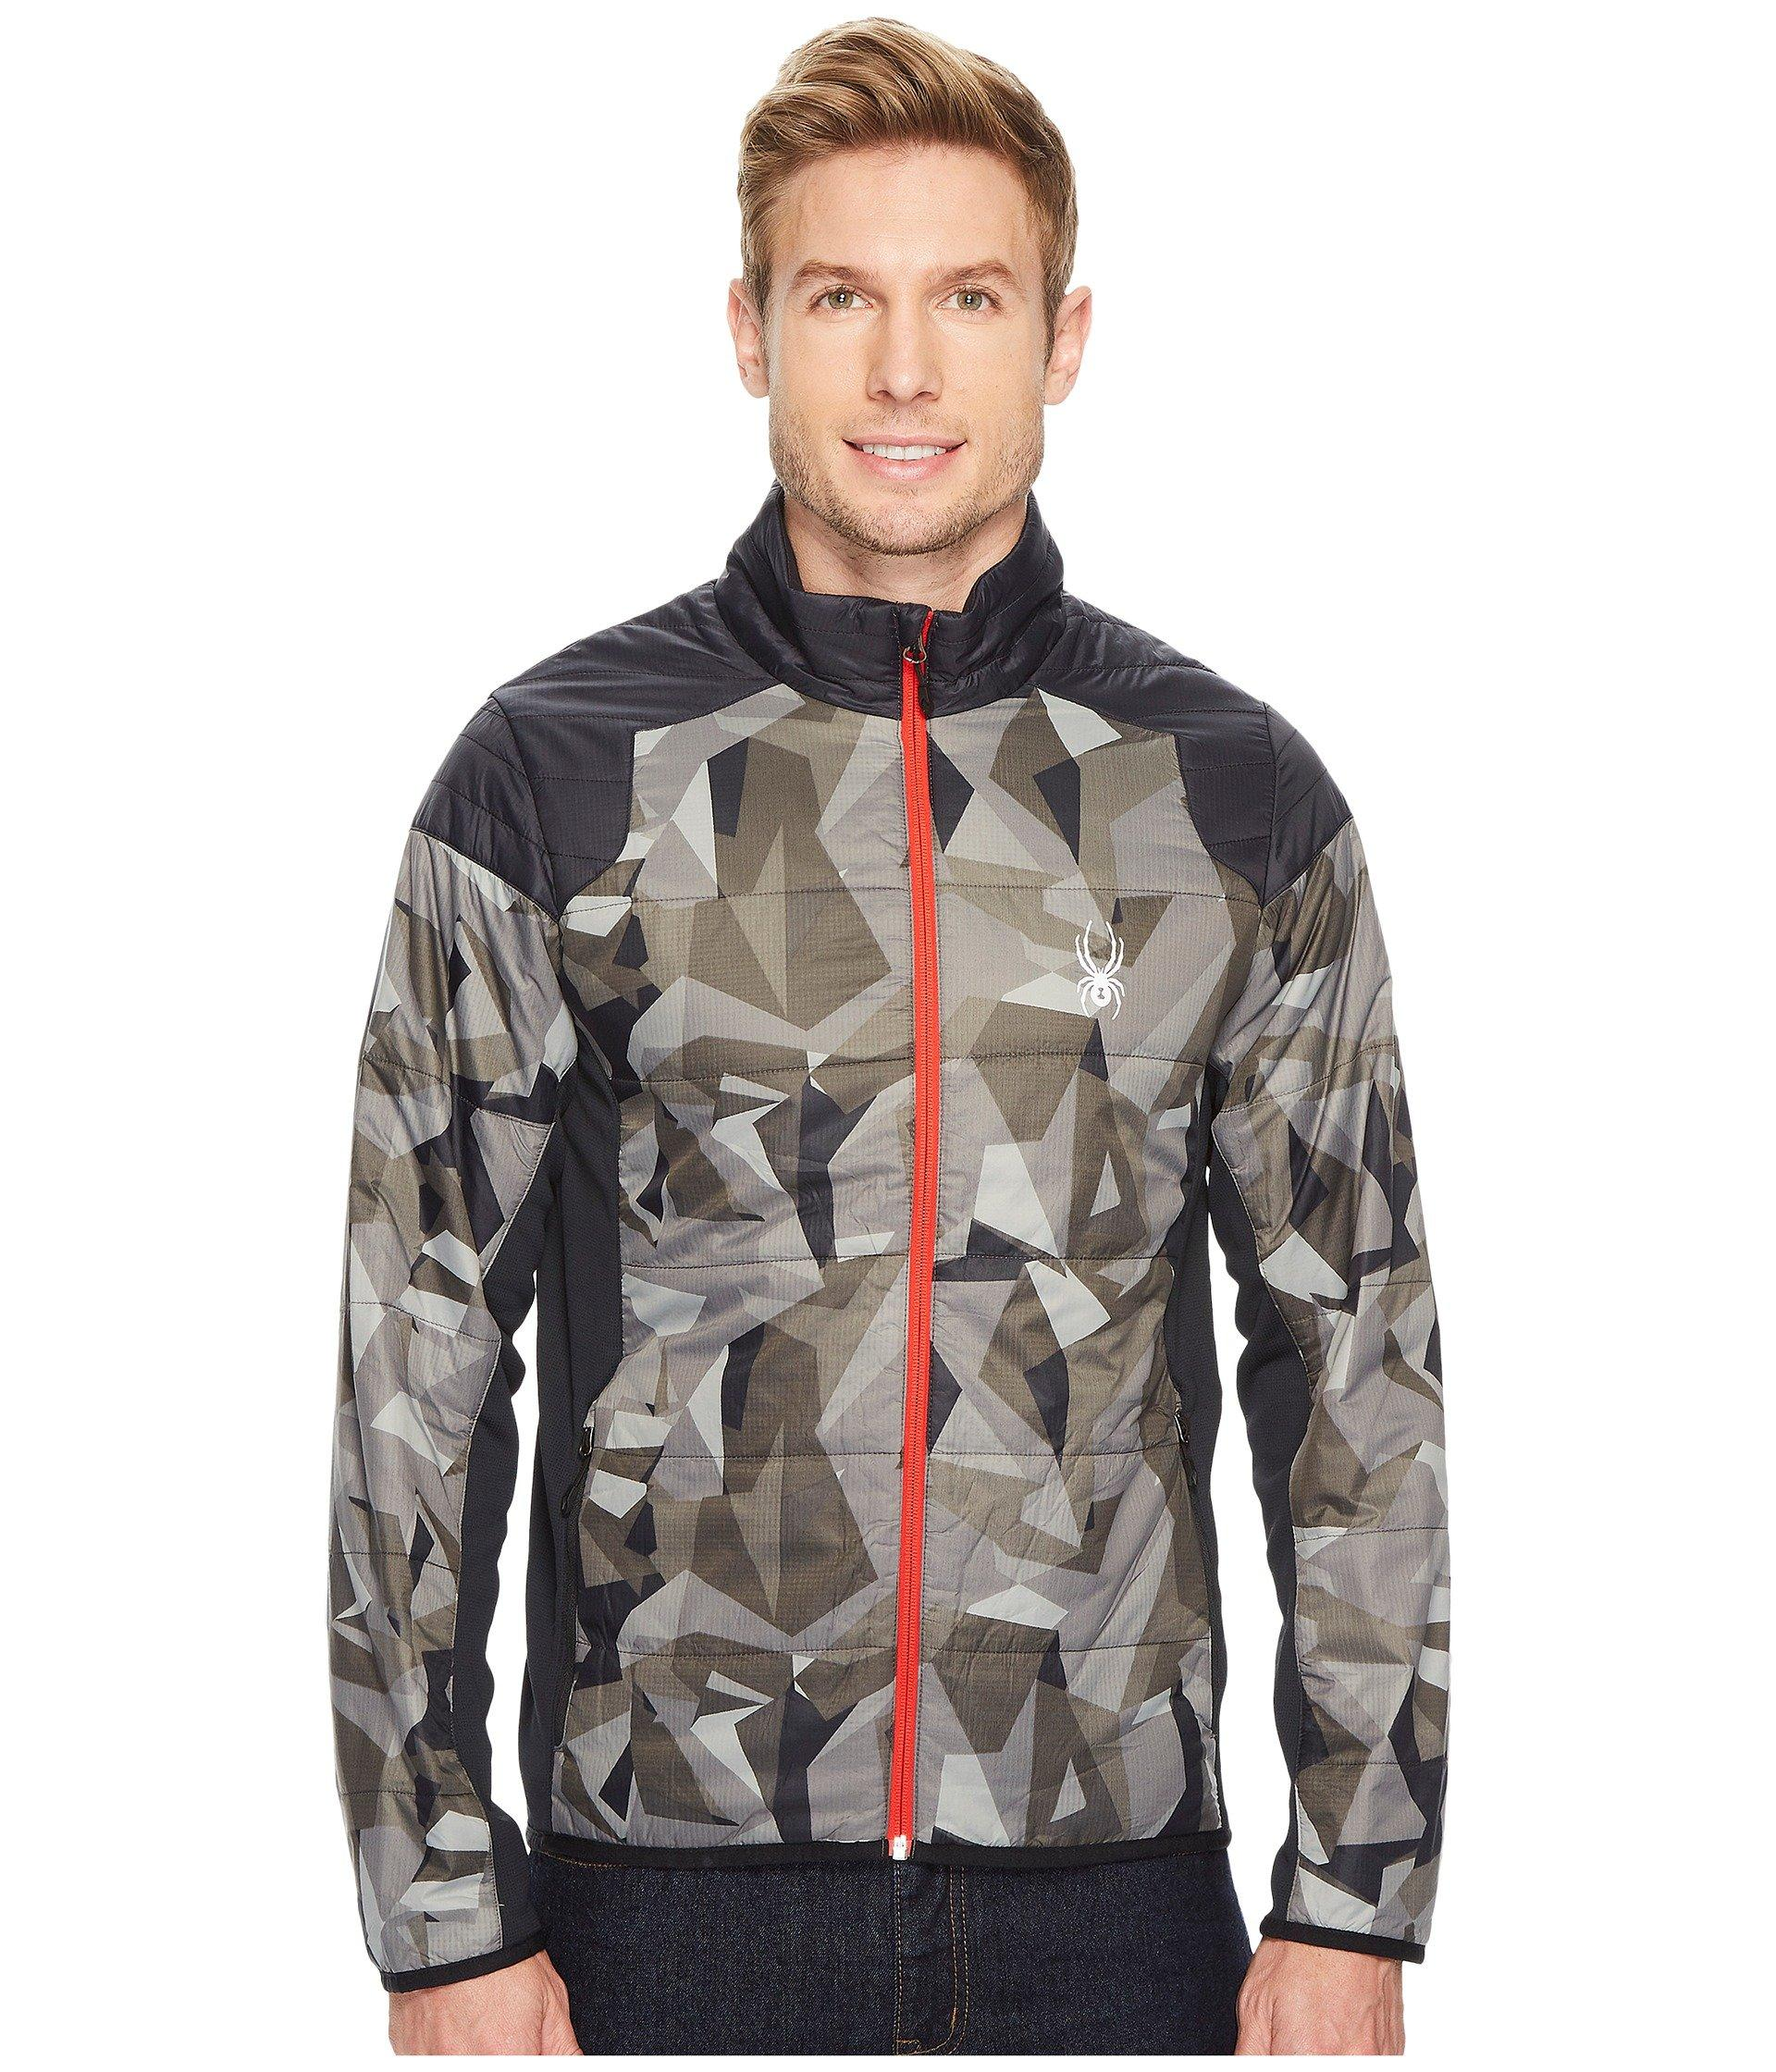 79560ad10dbf0 Spyder Glissade Full Zip Insulator Jacket, Black Camo Print/Black/Black